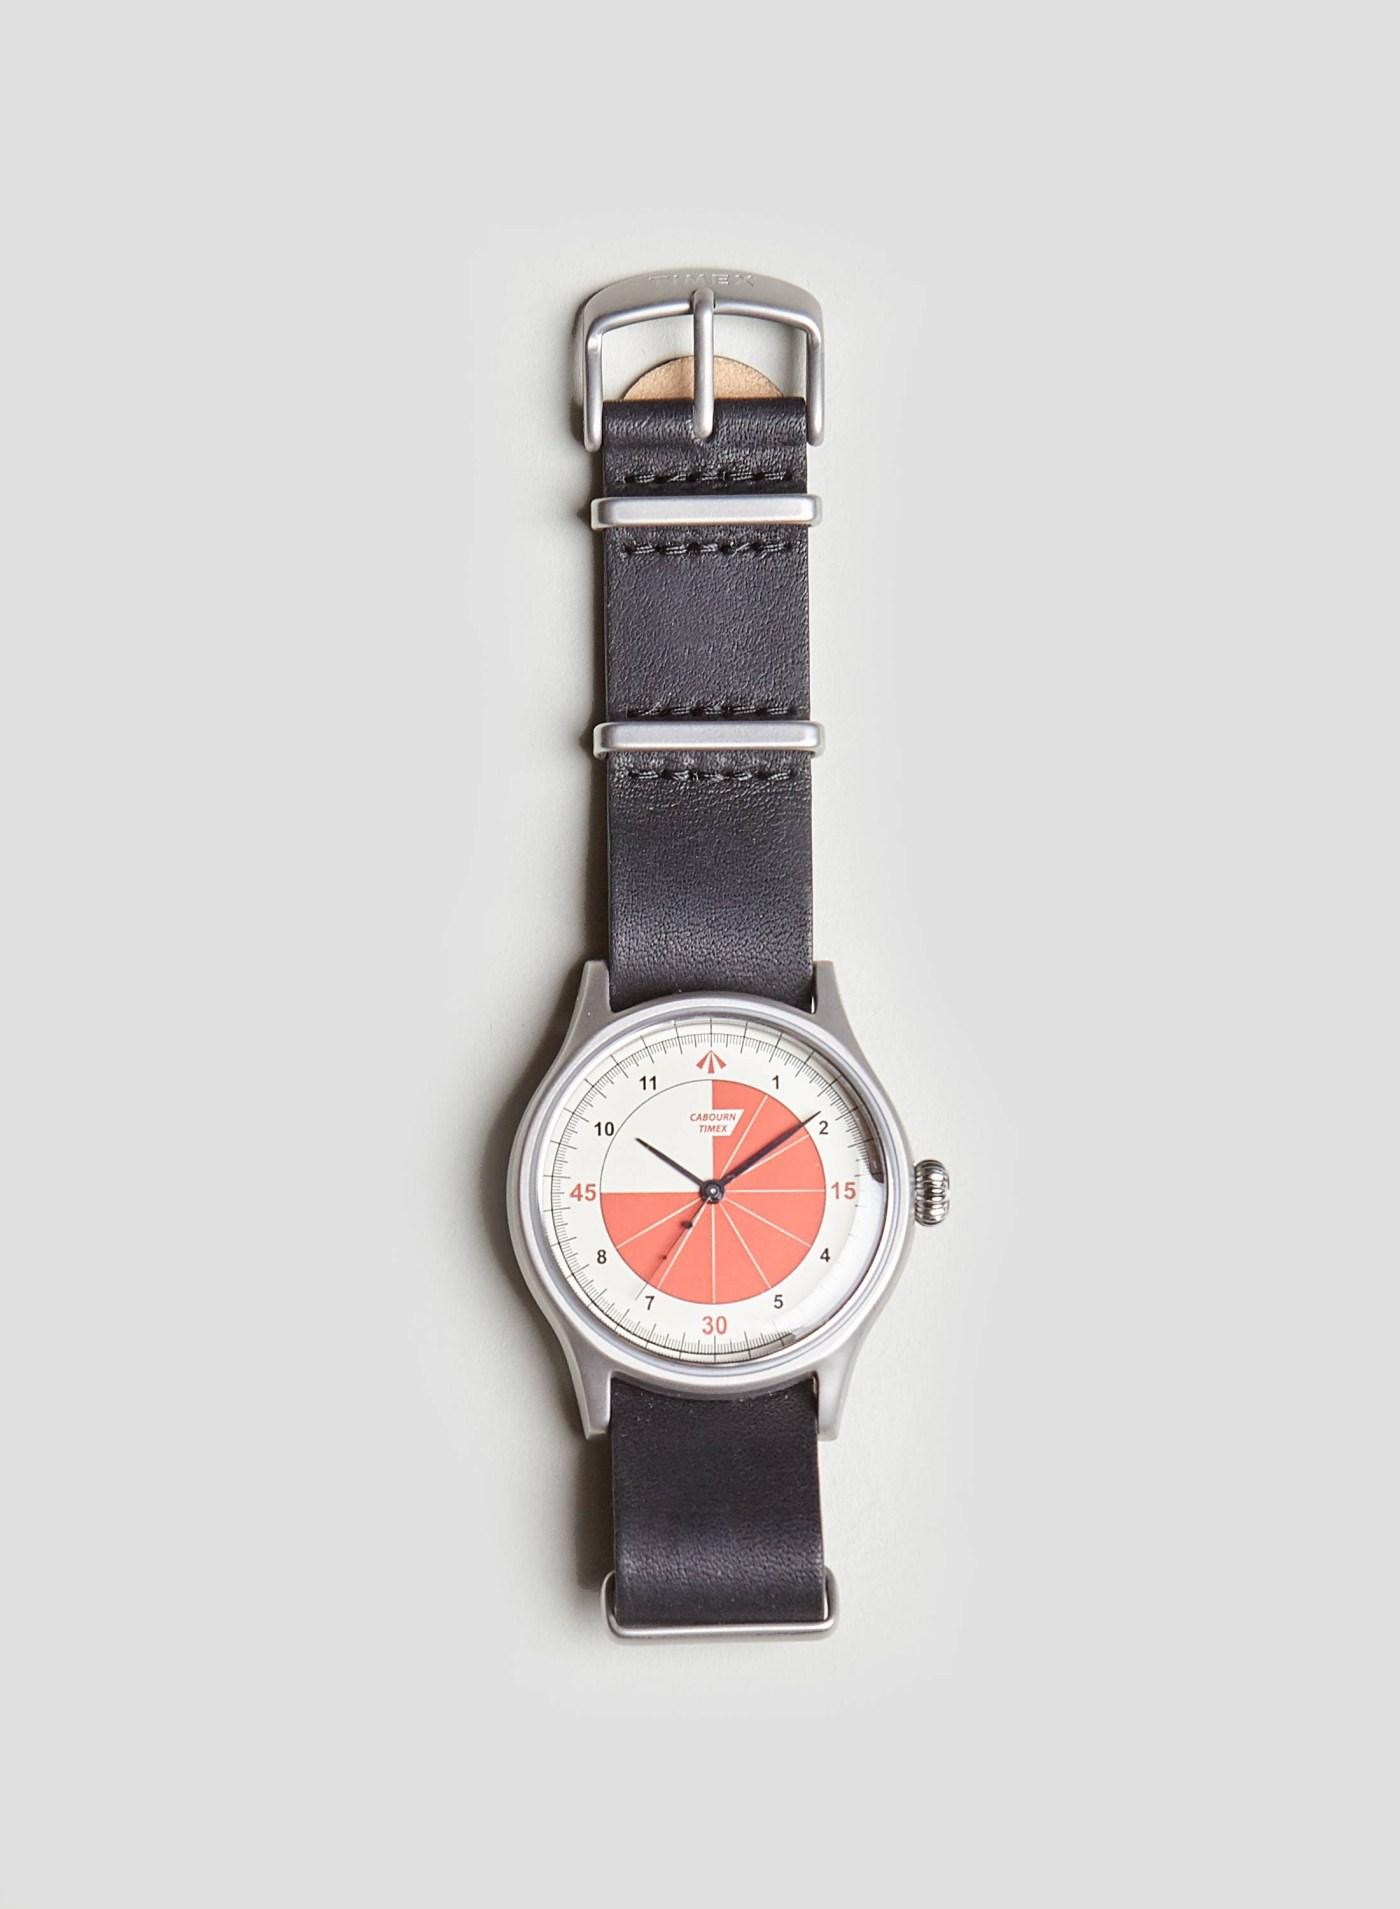 Timex Nigel Cabourn 2019 collaboration